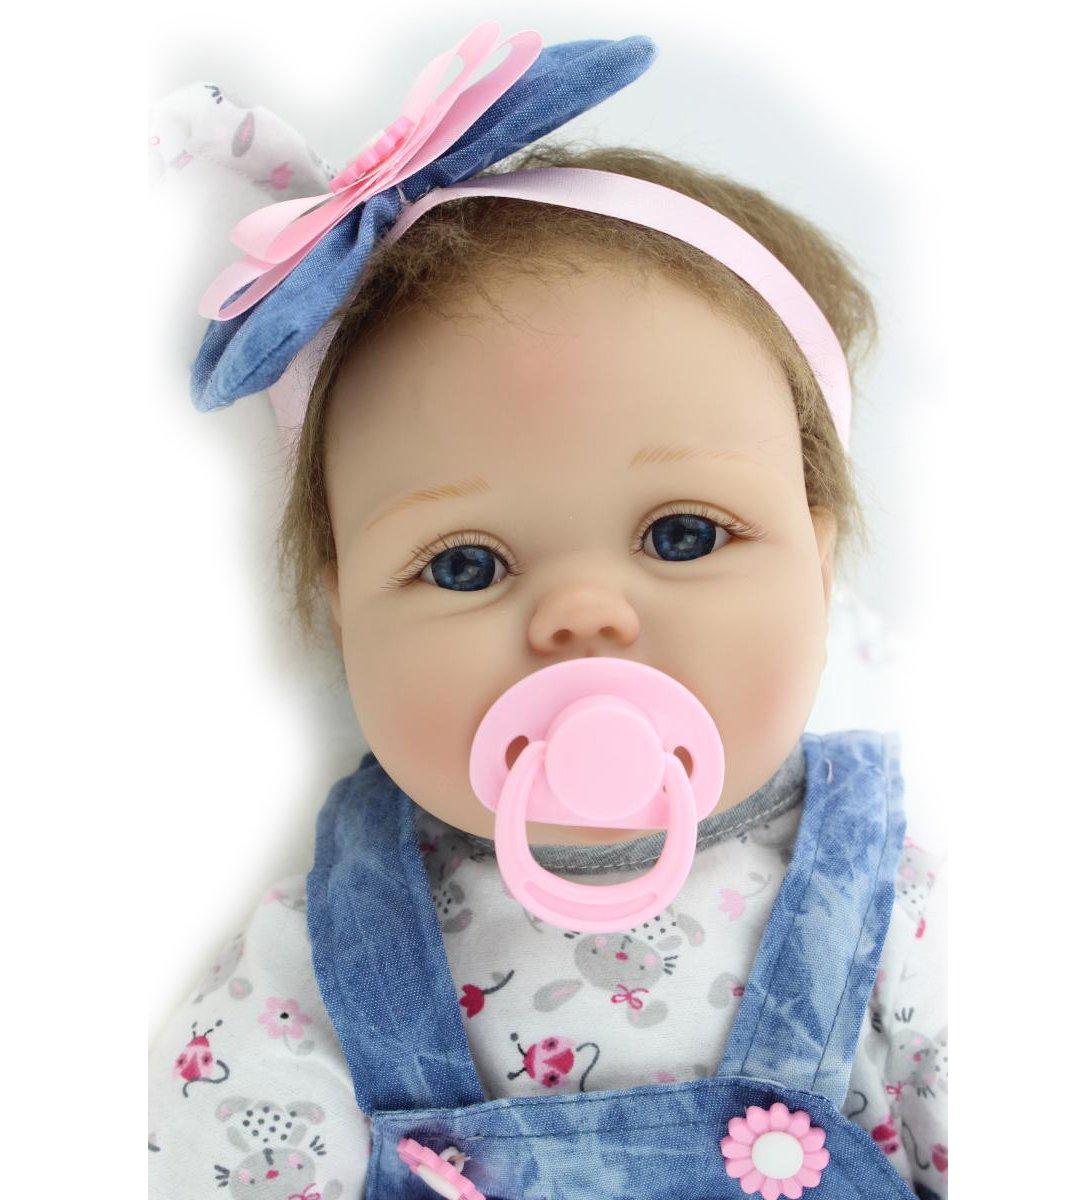 NPK Reborn Babypuppen Soft Silikon Vinyl 22 inch 55 cm Magnetic Schnuller Lebensechte Newborn Babypuppe Reborn Baby Dolls